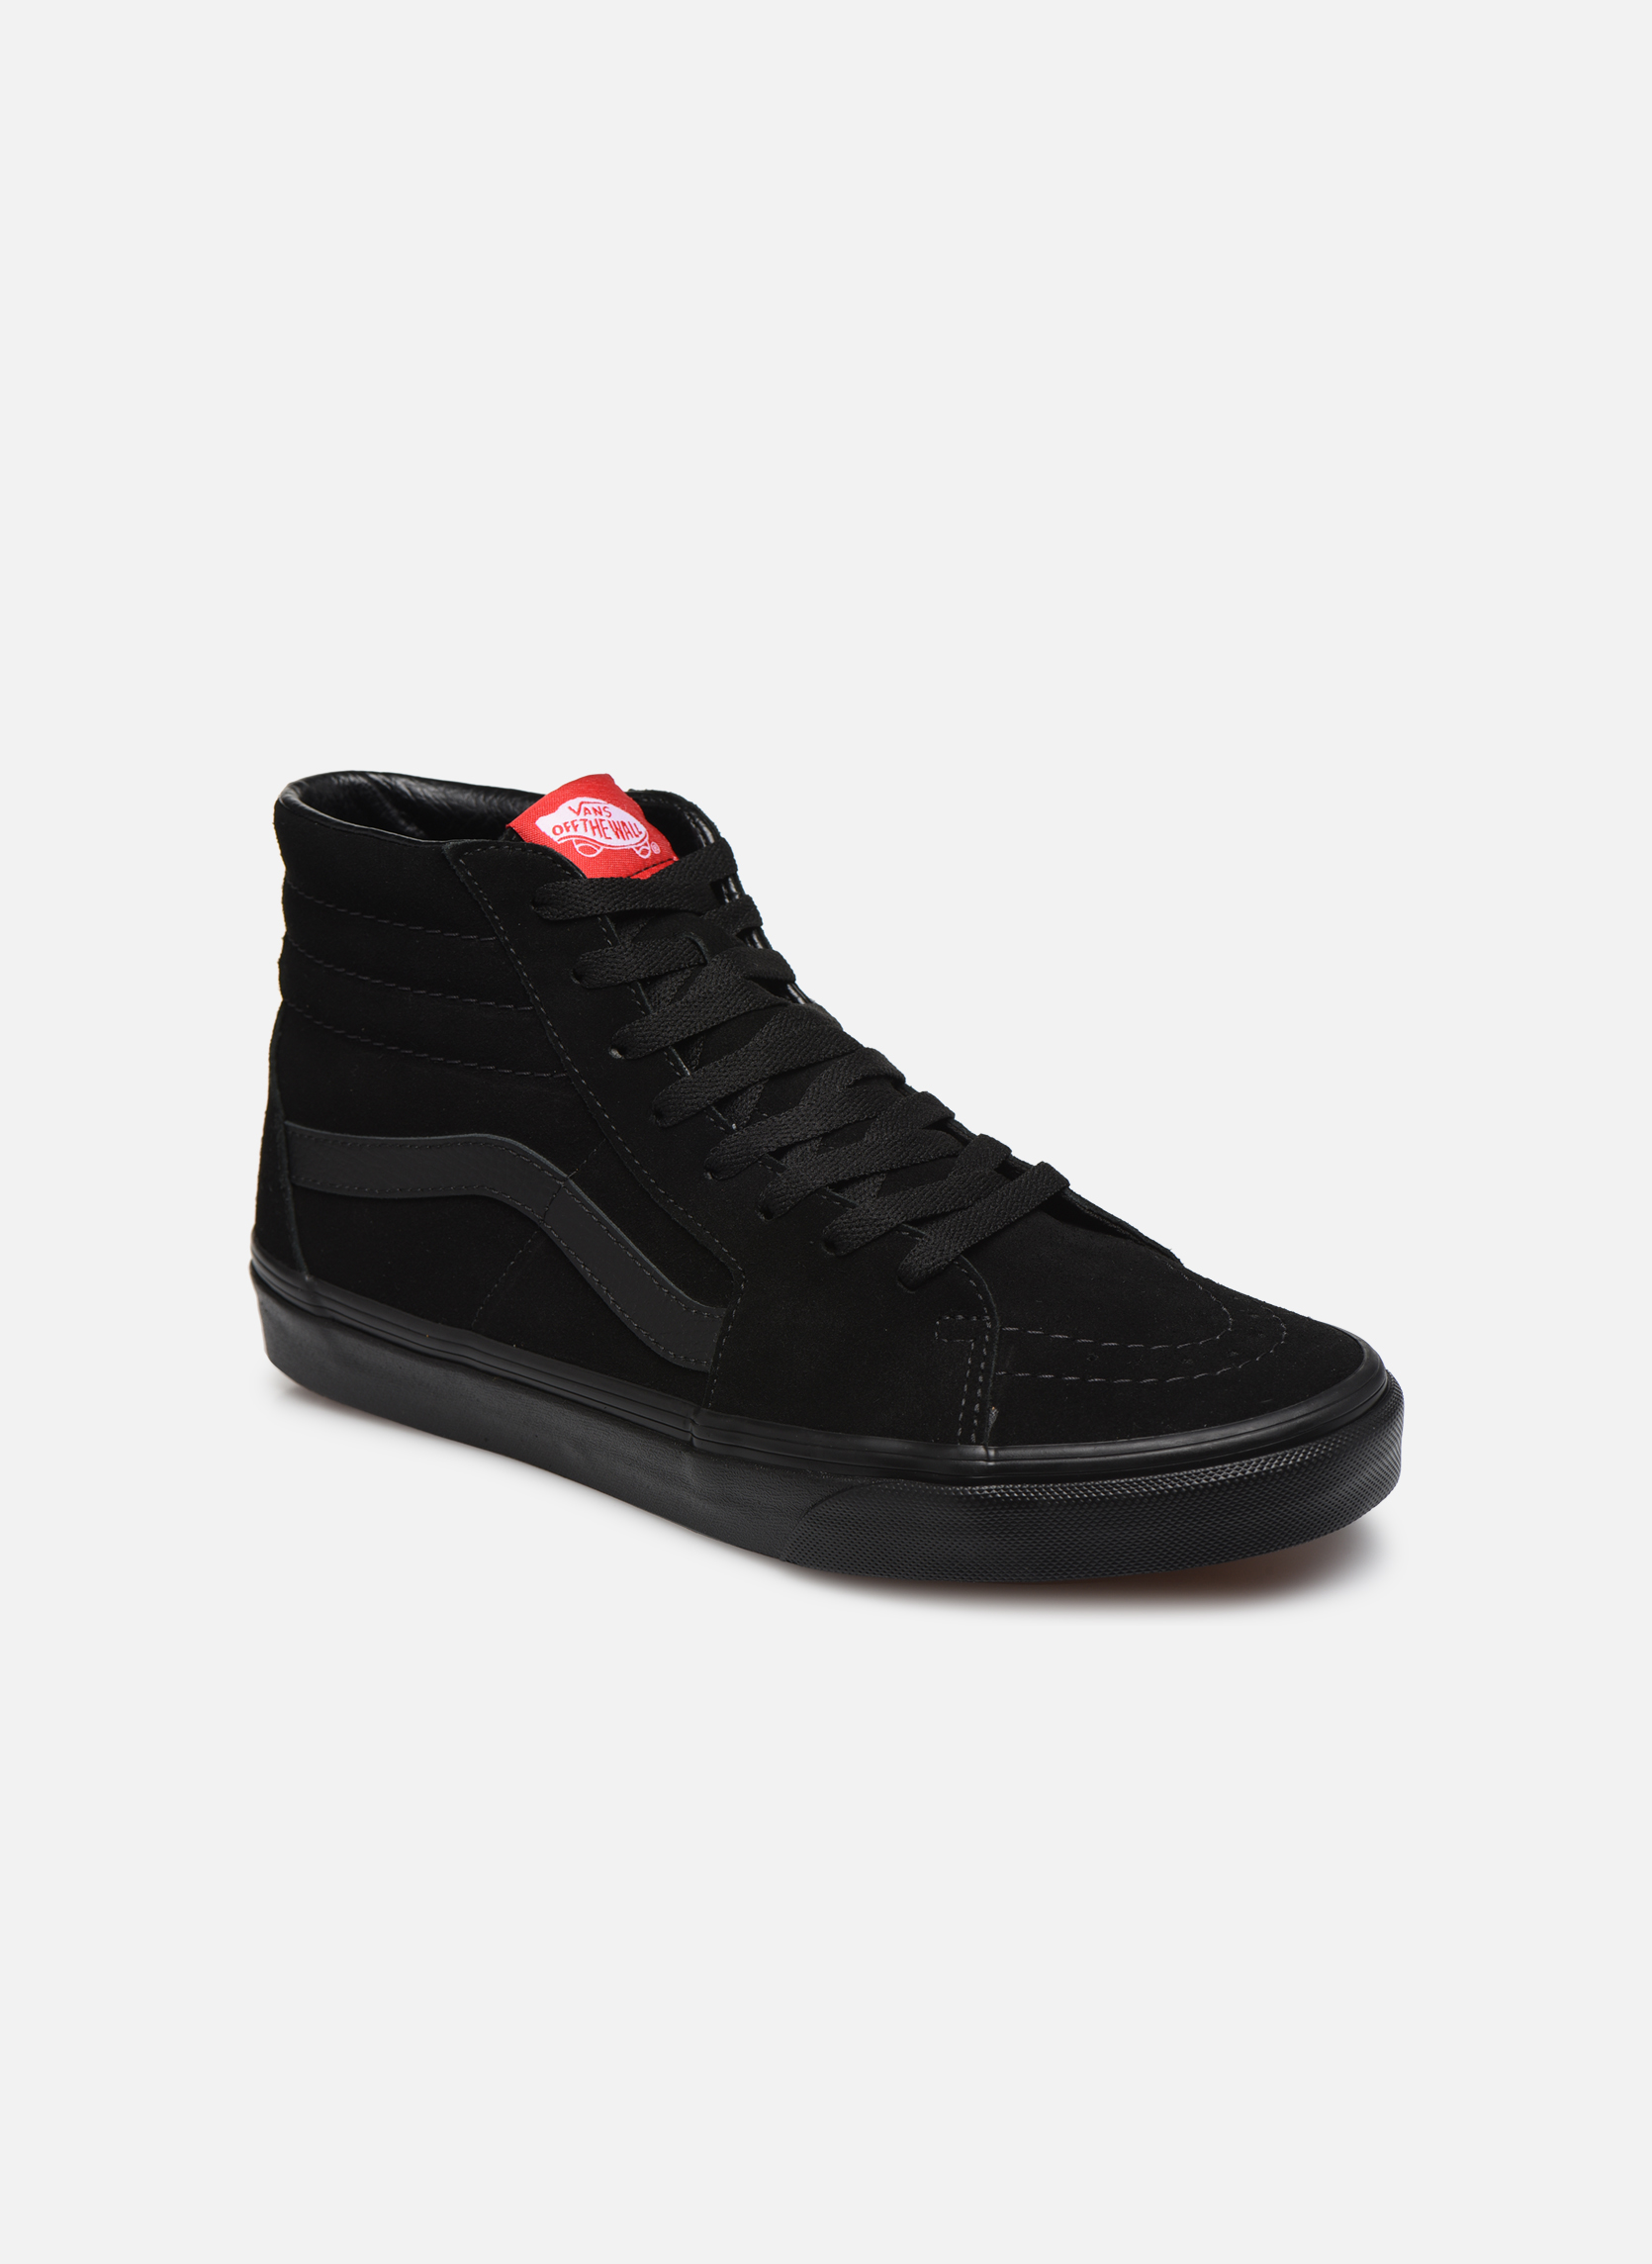 SK8 Hi M Black/black/black